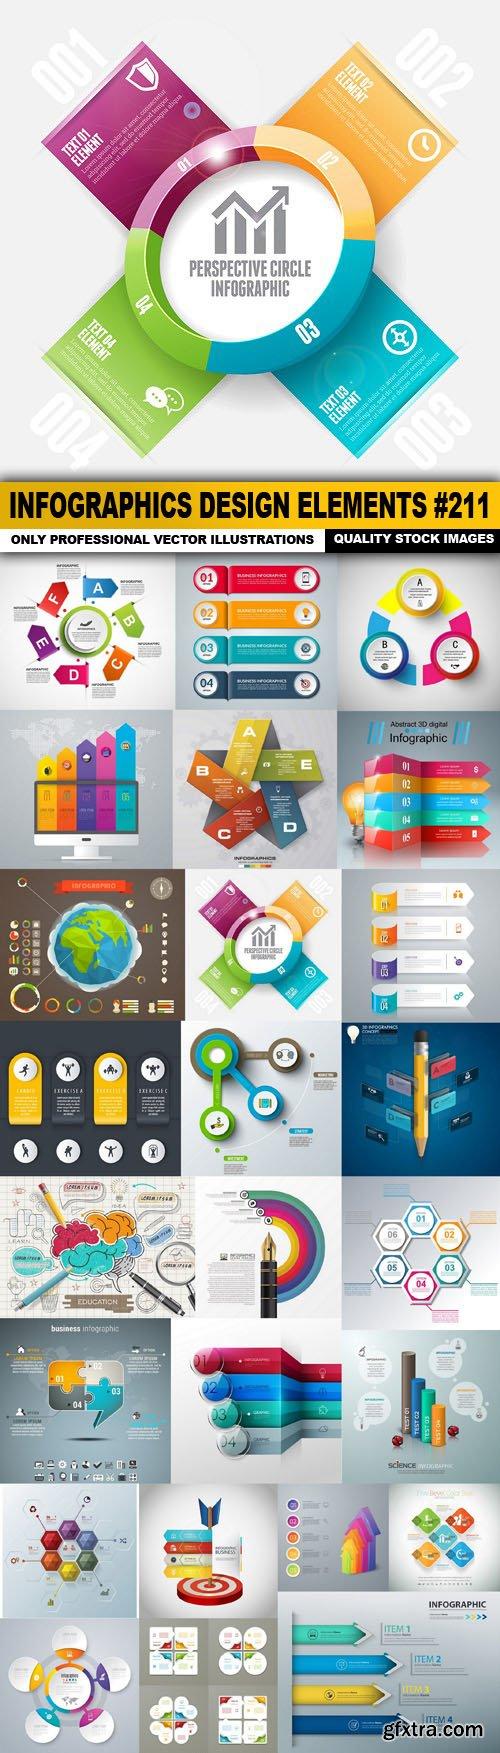 Infographics Design Elements #211 - 25 Vector